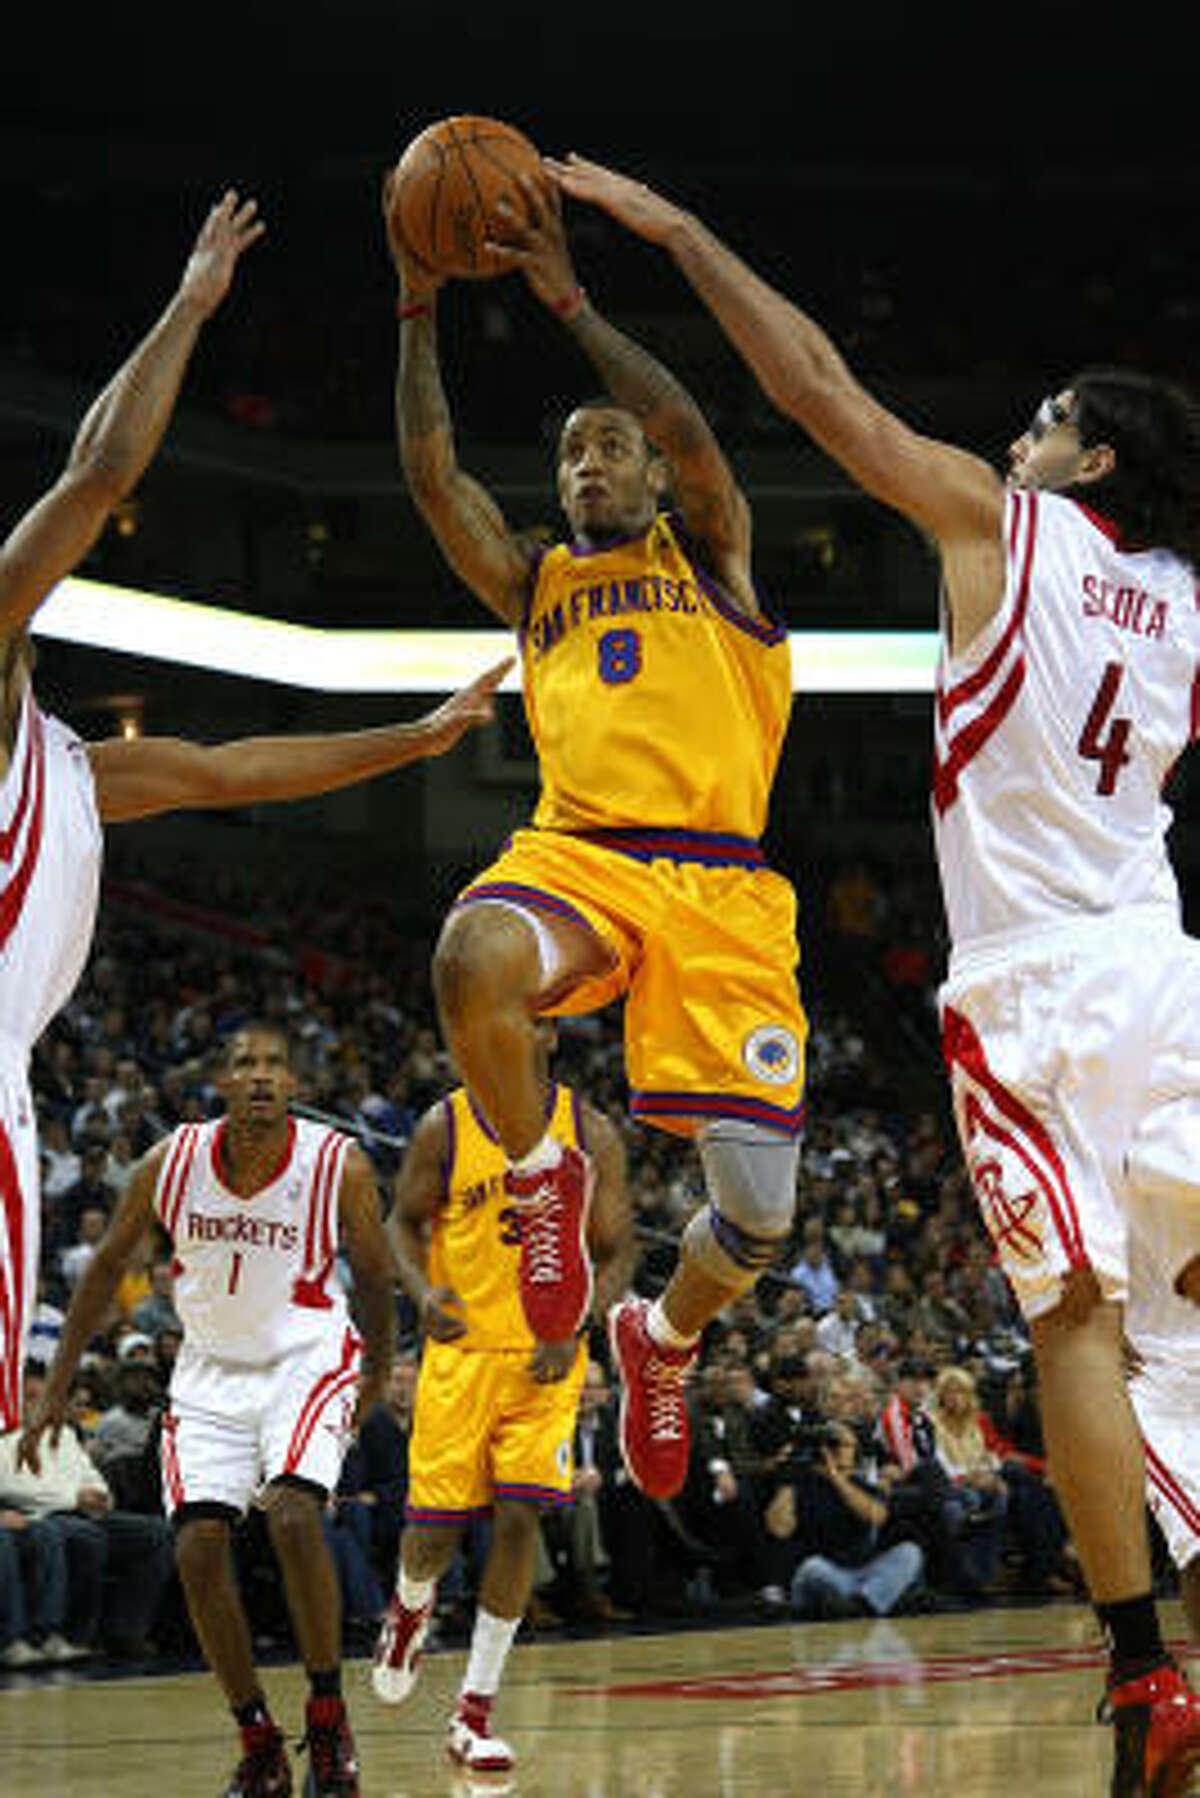 Warriors guard Monta Ellis drives against Rockets forward Luis Scola.